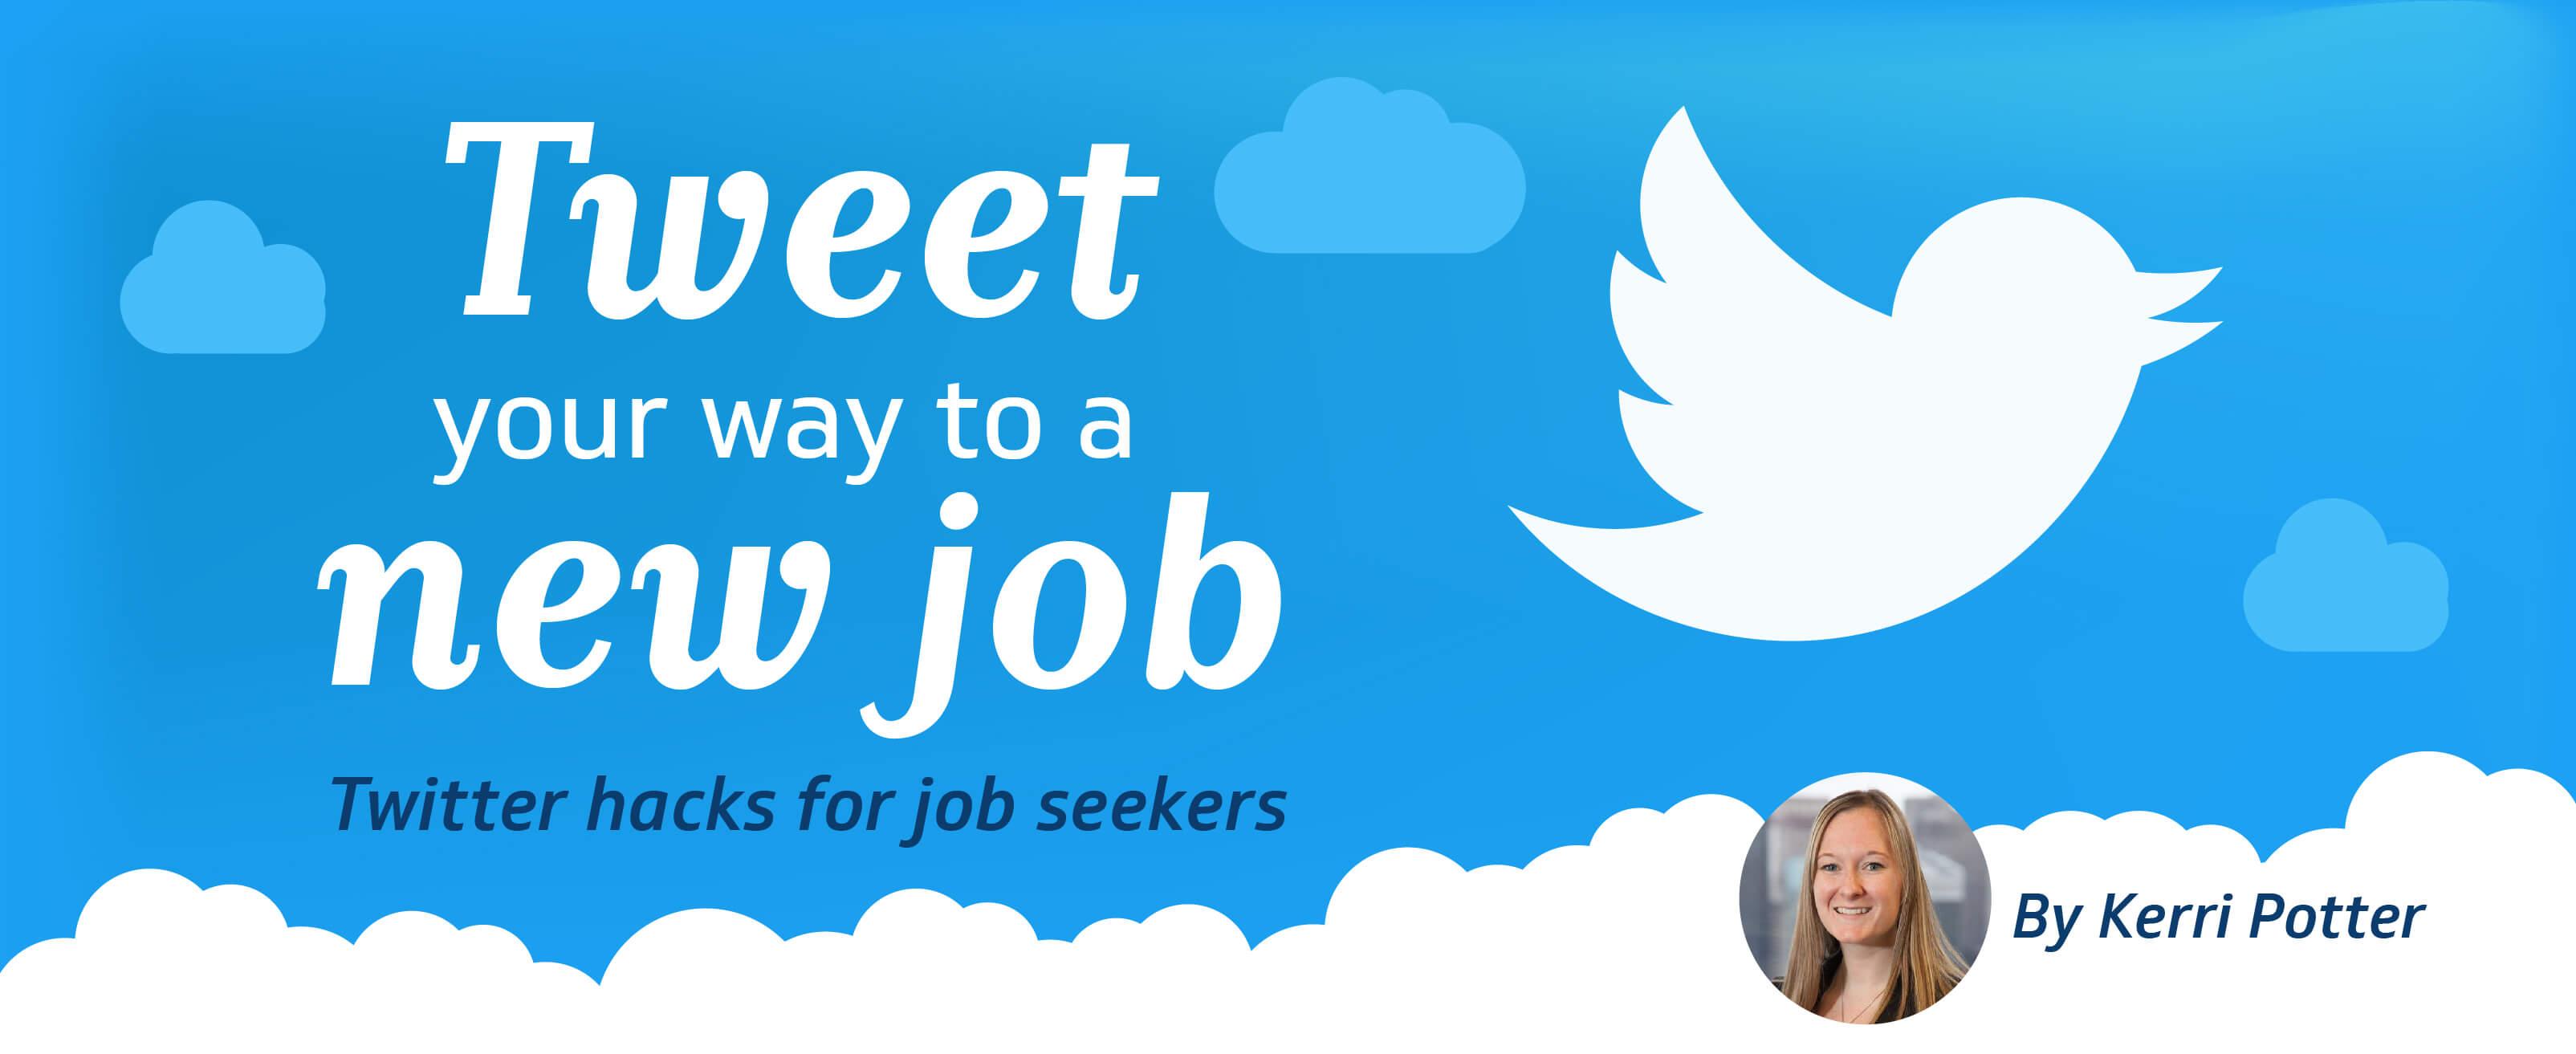 twitter hacks for job seekers